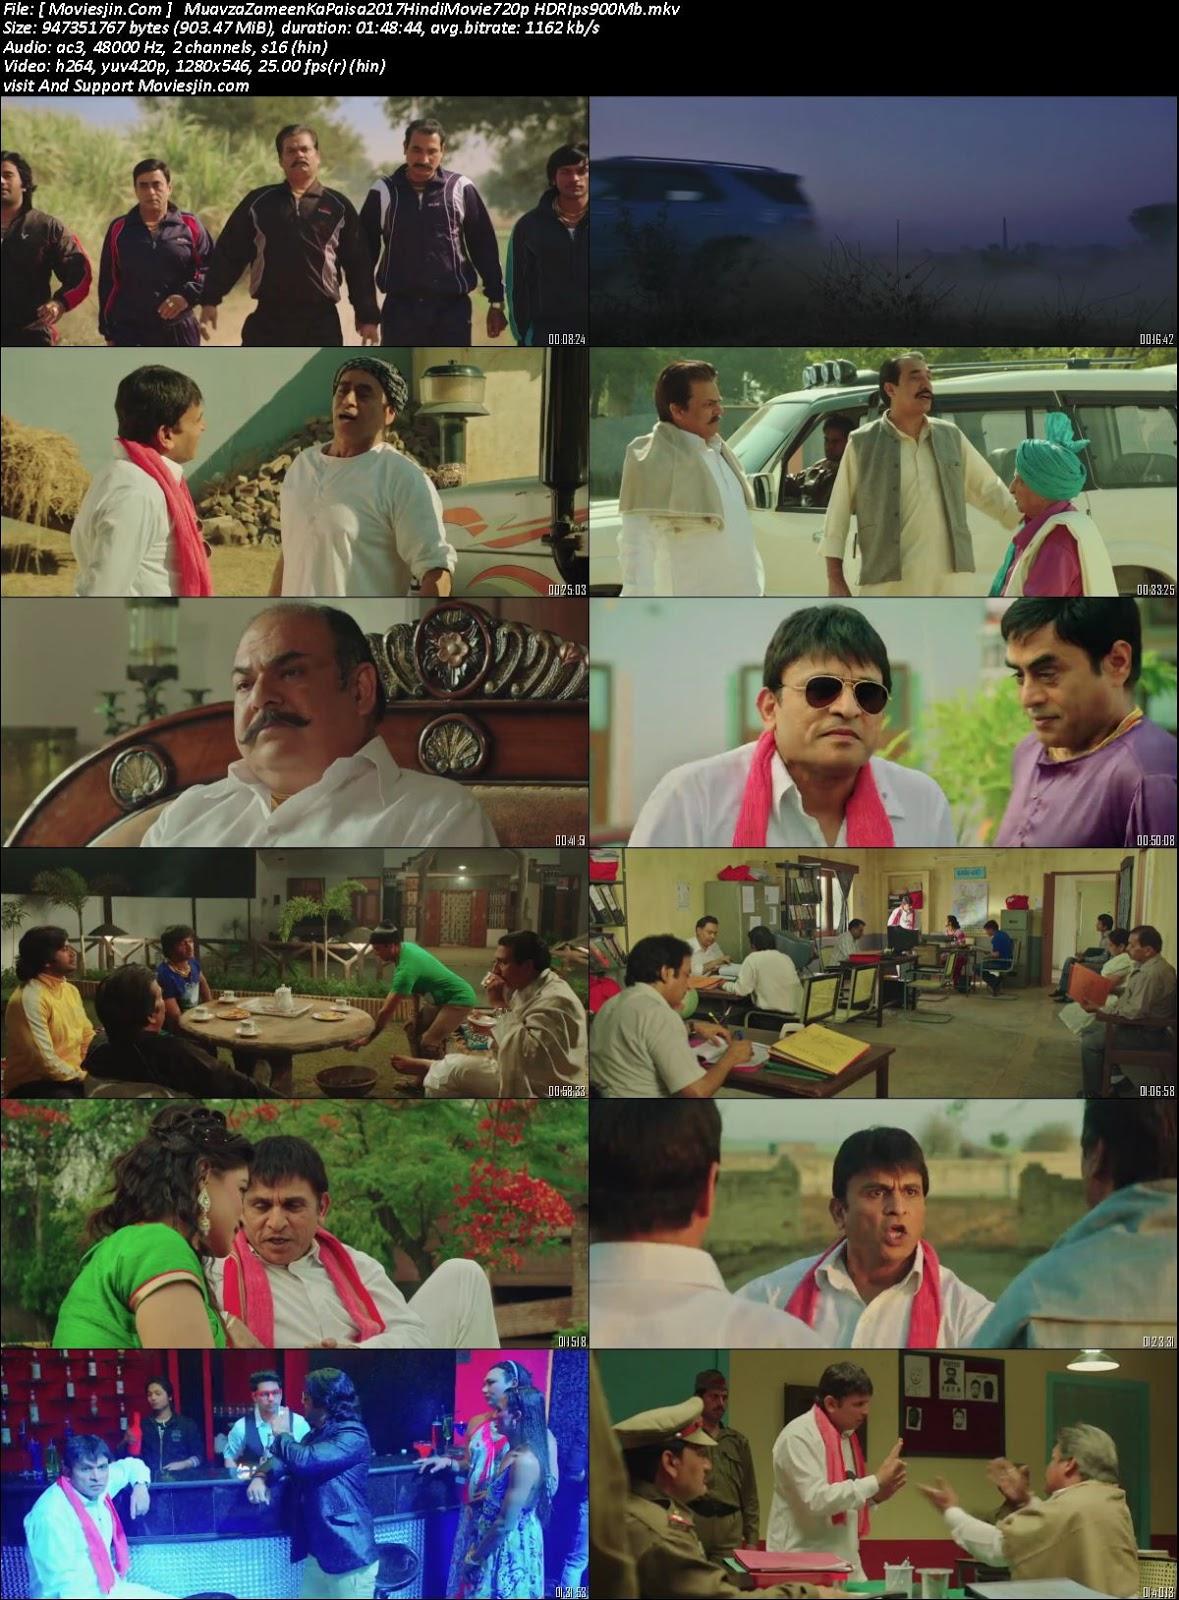 Watch Online Muavza Zameen Ka Paisa 2017 Full Movie 900MB HD-Rip 720p Full Movie Download Khatrimaza, free download 9xmovies,